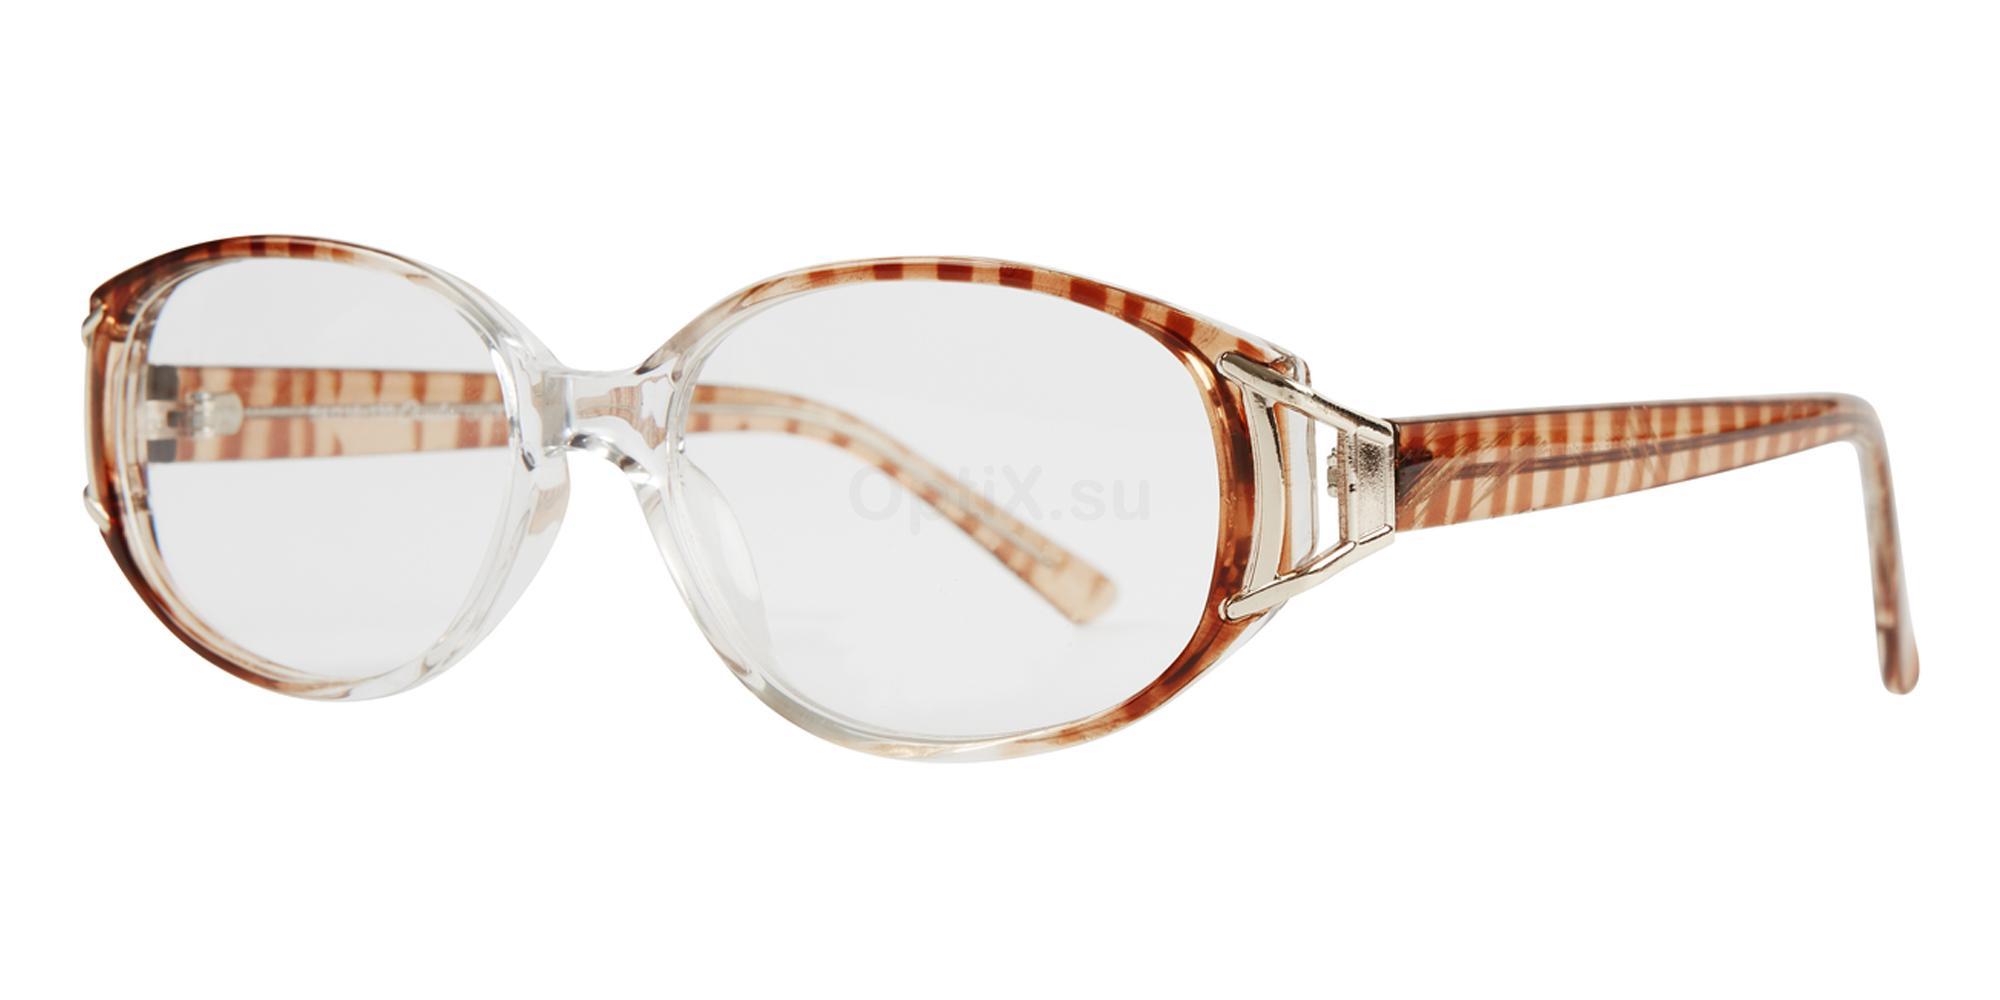 C1 Complete Mod 2 Glasses, Complete